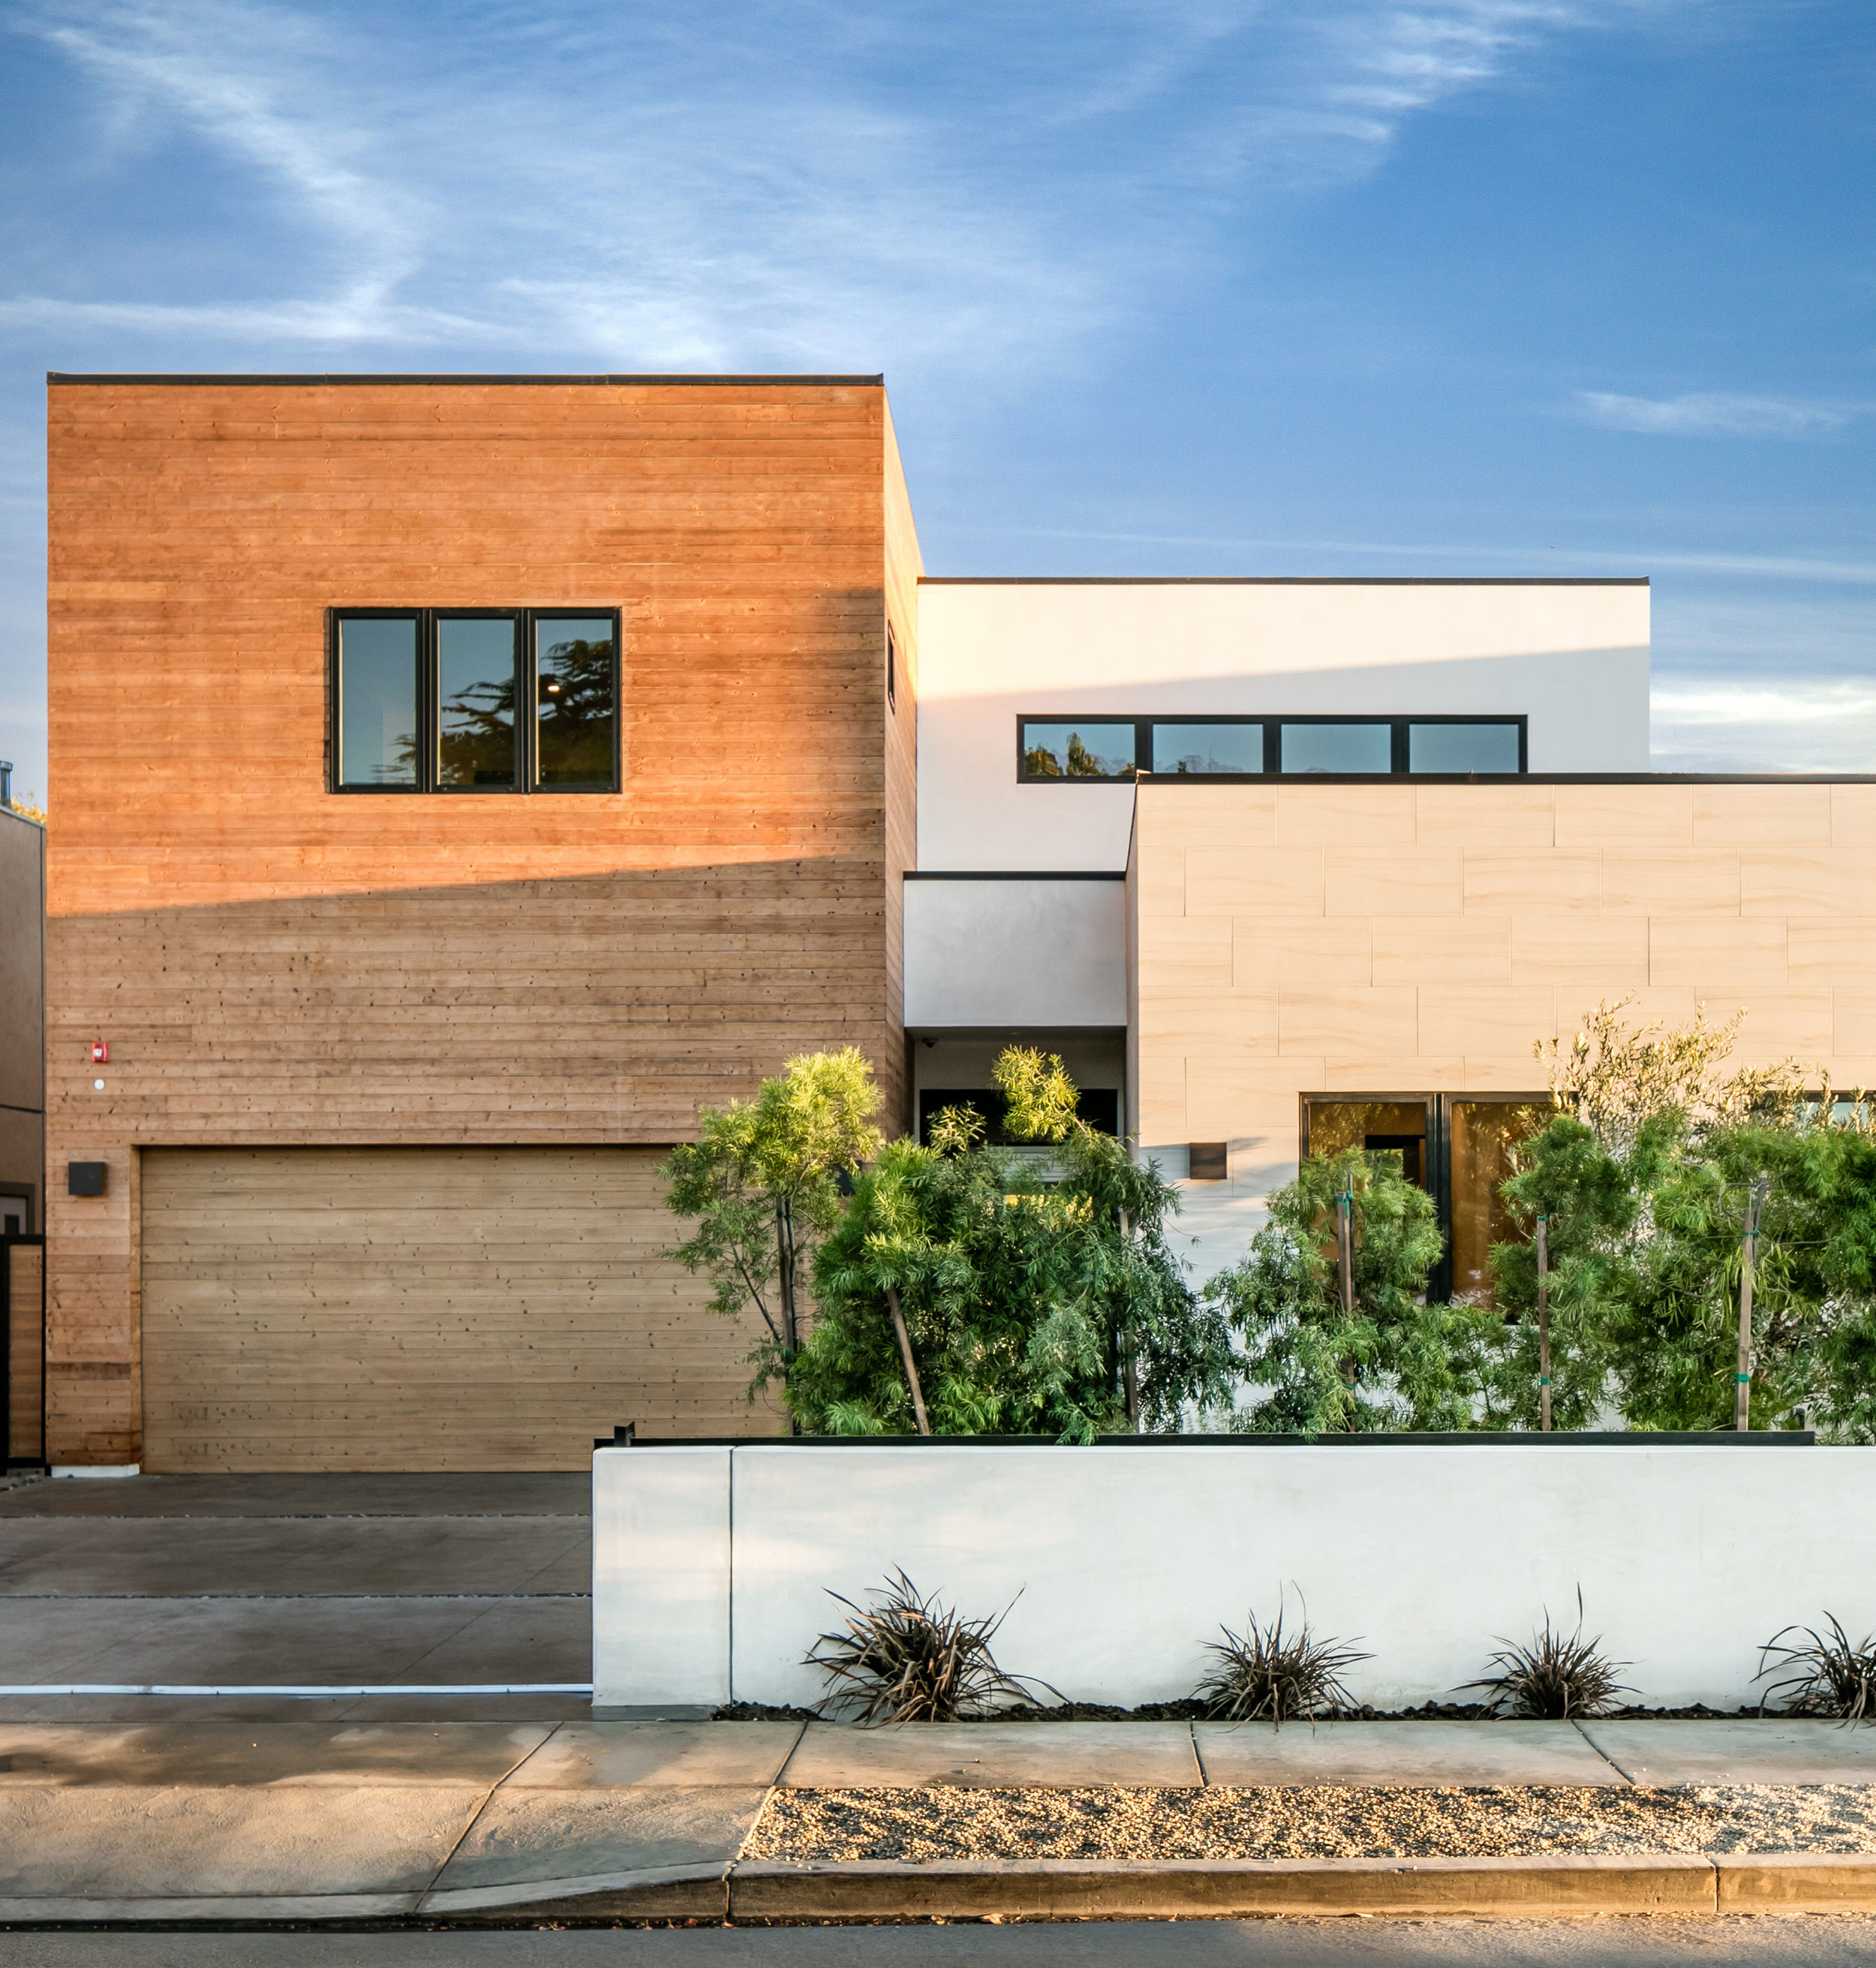 1-Contemporary-Architecture-LosAngeles-exterior-SiliconBay.jpg